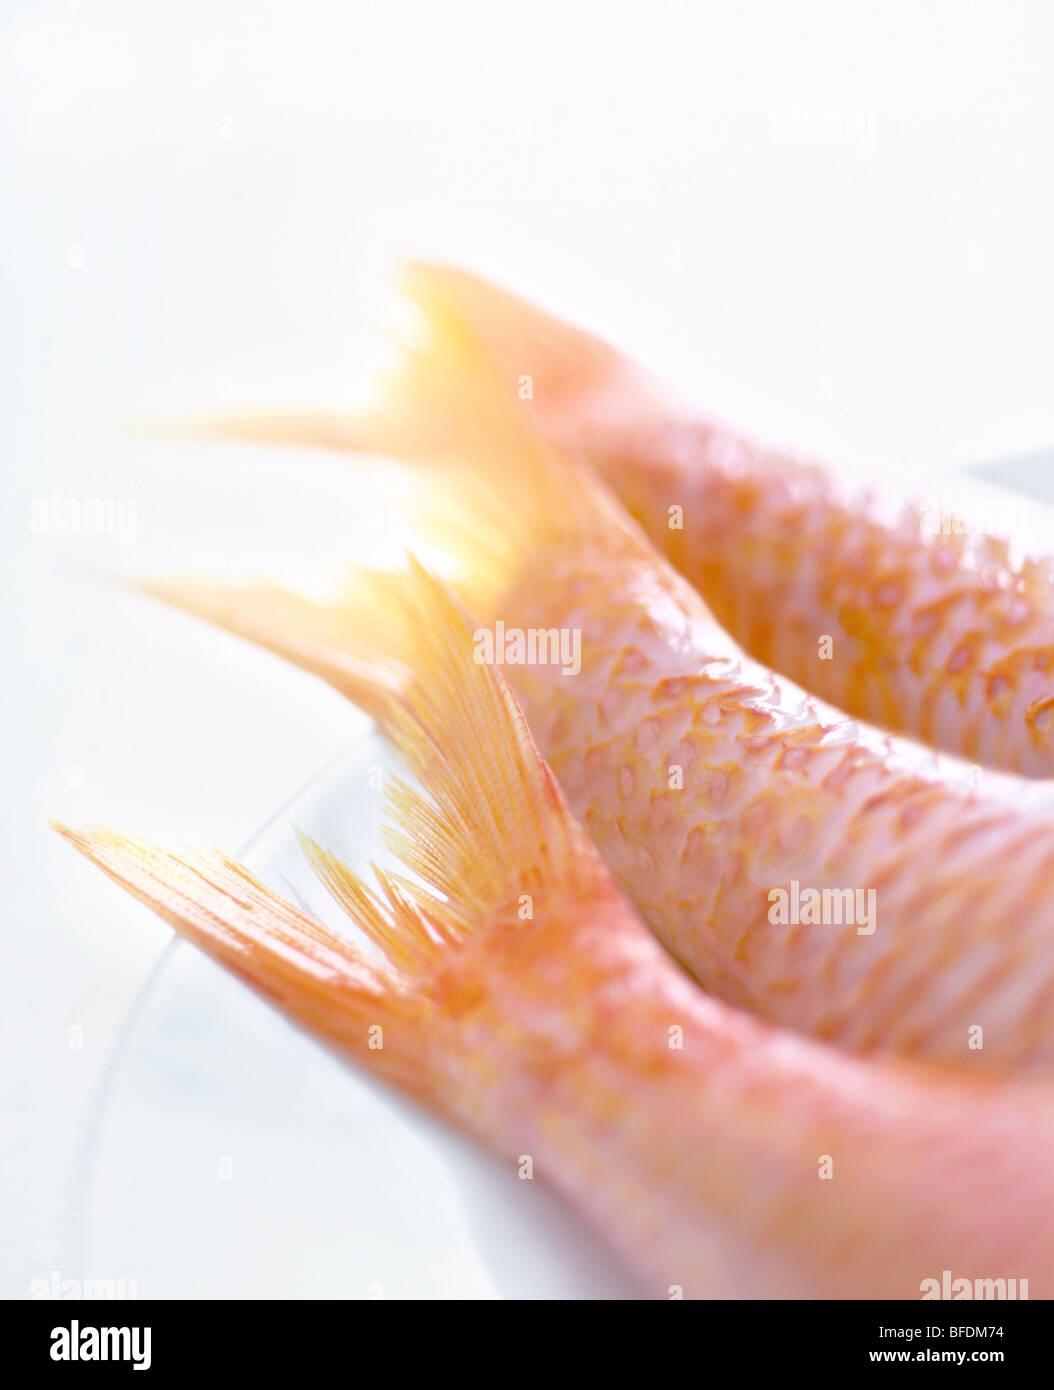 Code di pesce Immagini Stock